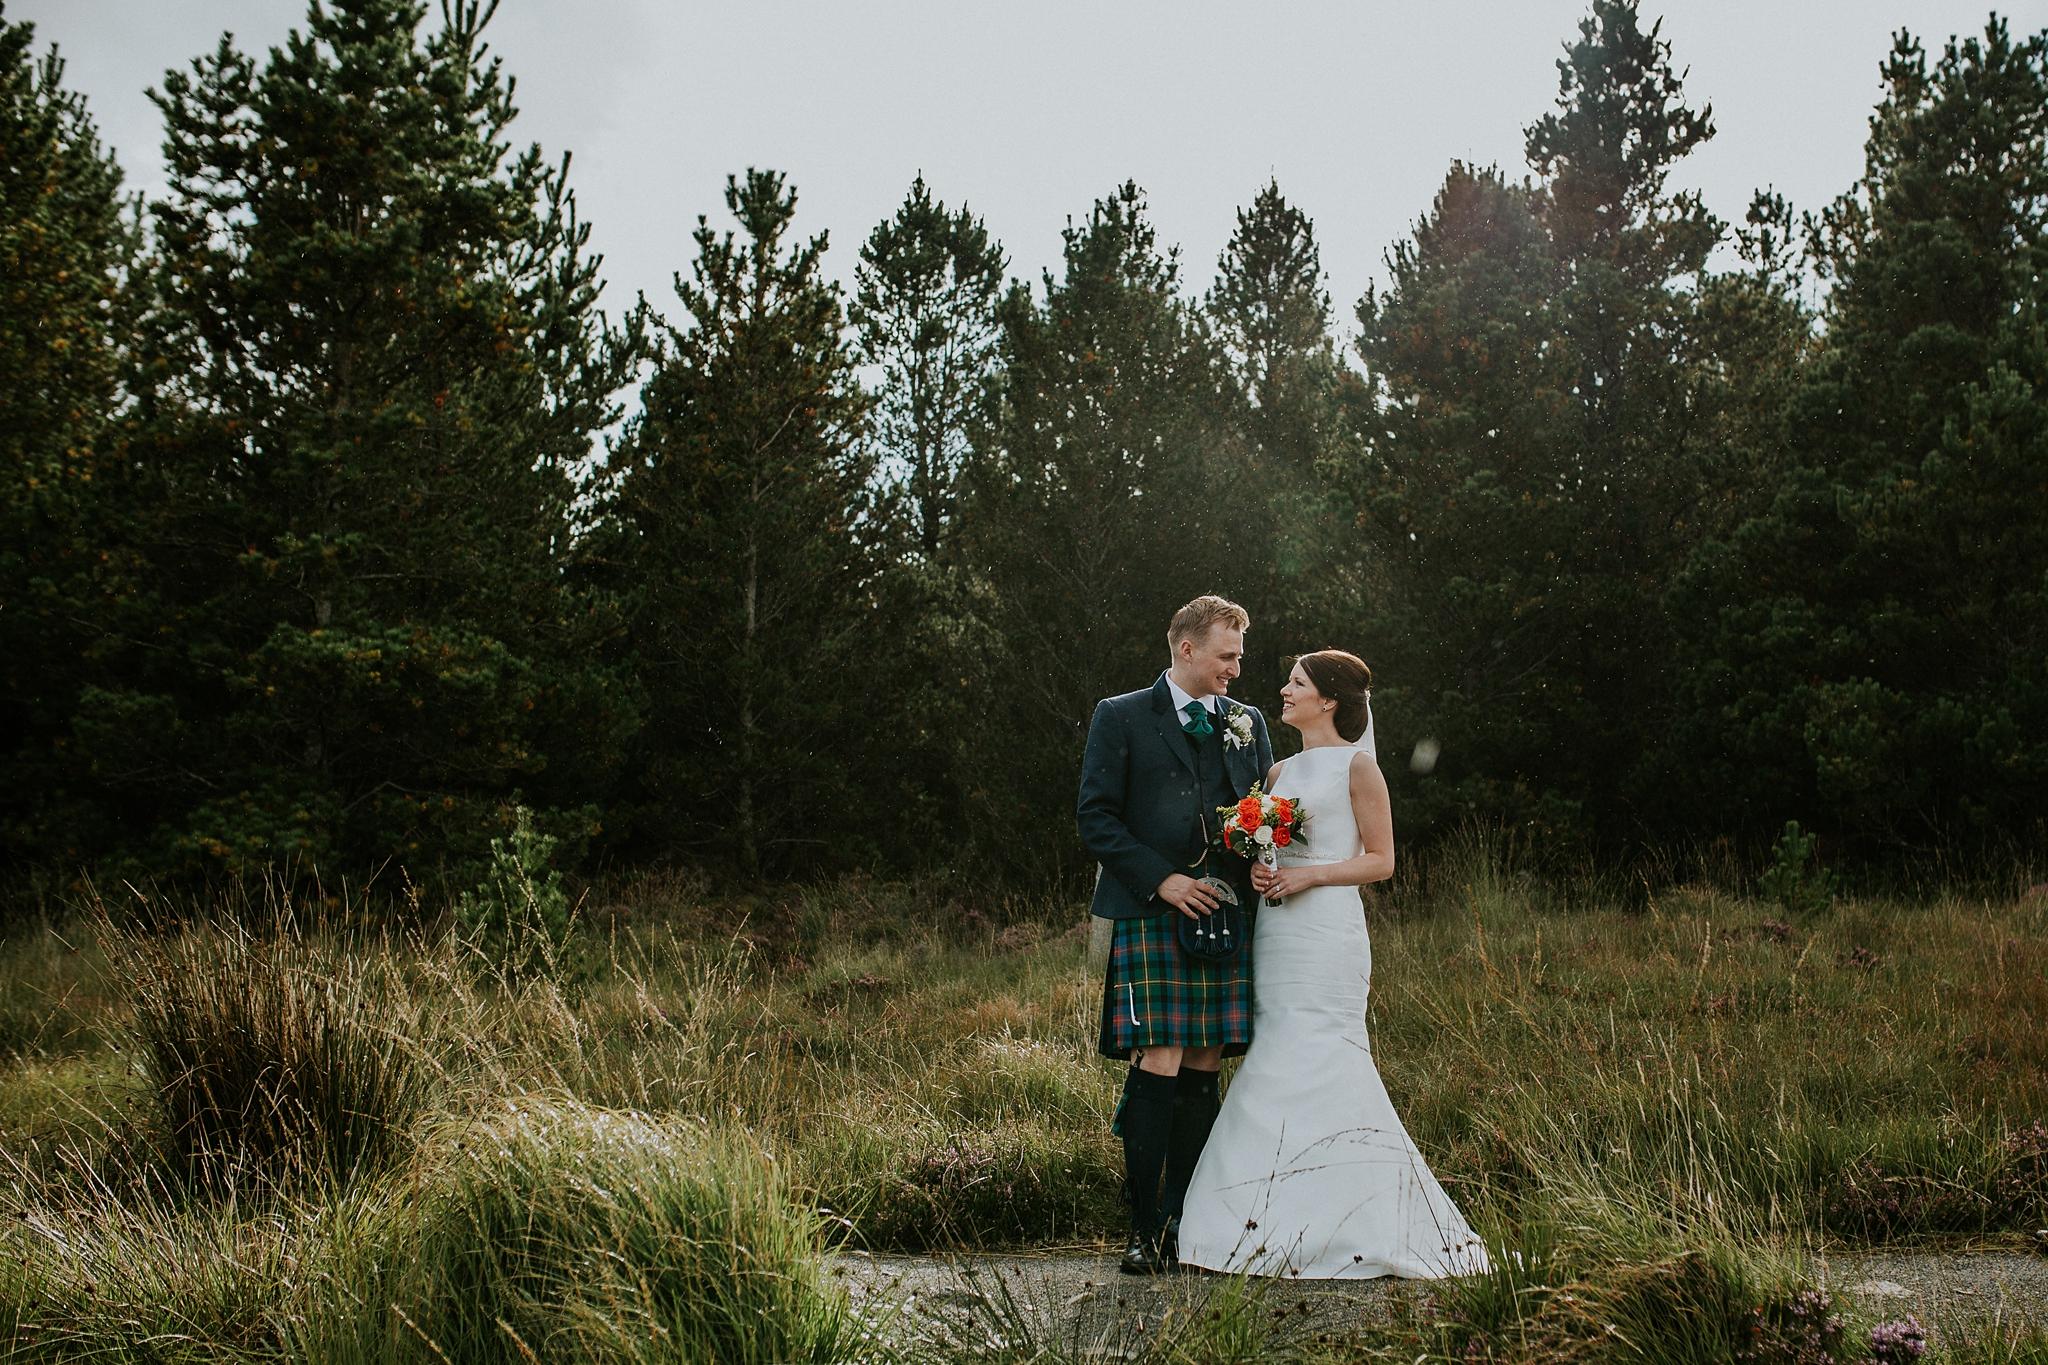 Linda&Shockie_northuist_wedding_photographer-34.JPG